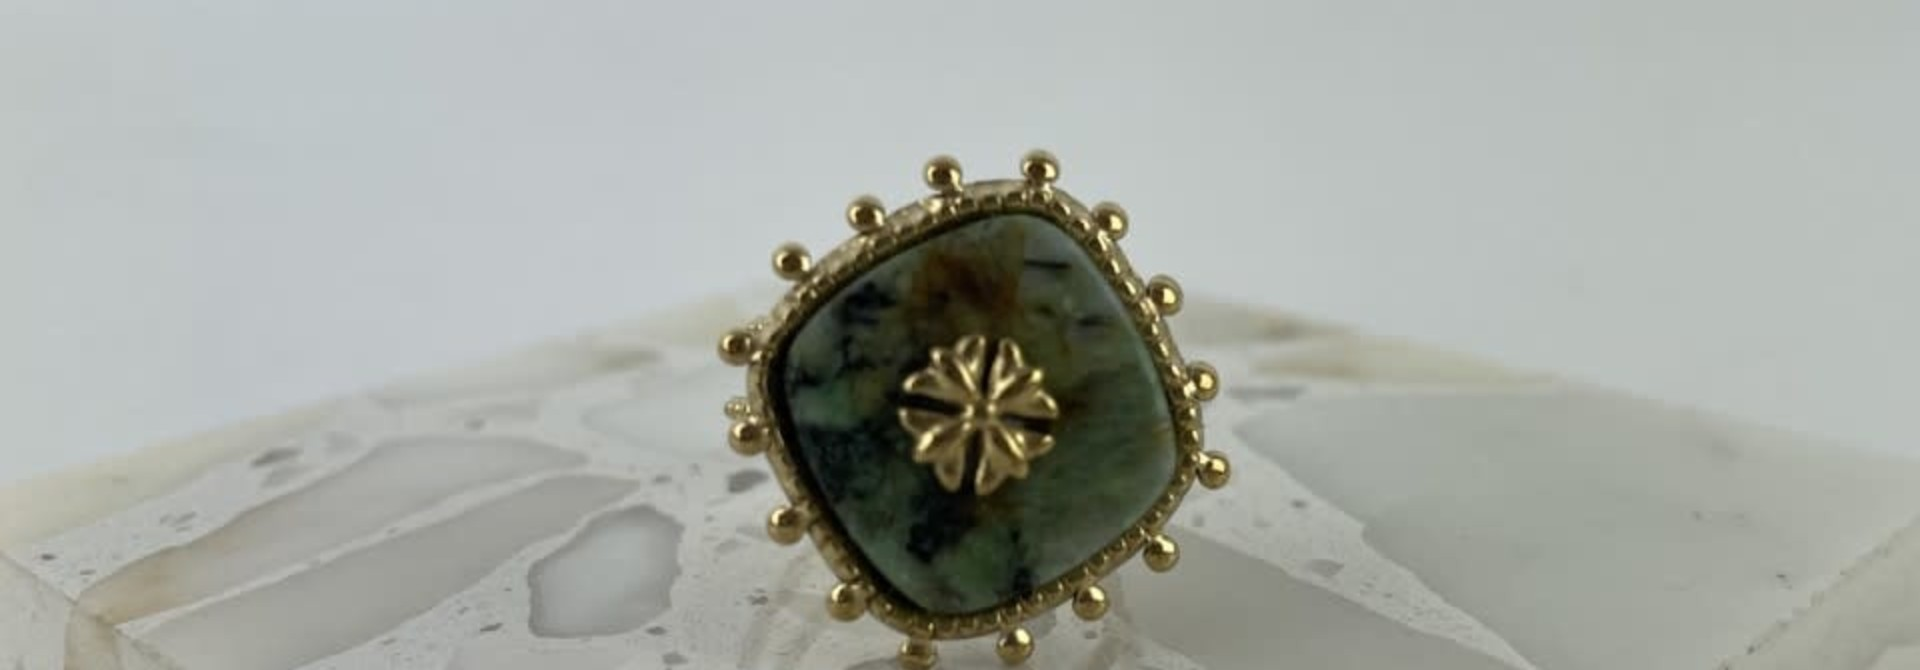 Lovida squared marble ring Green